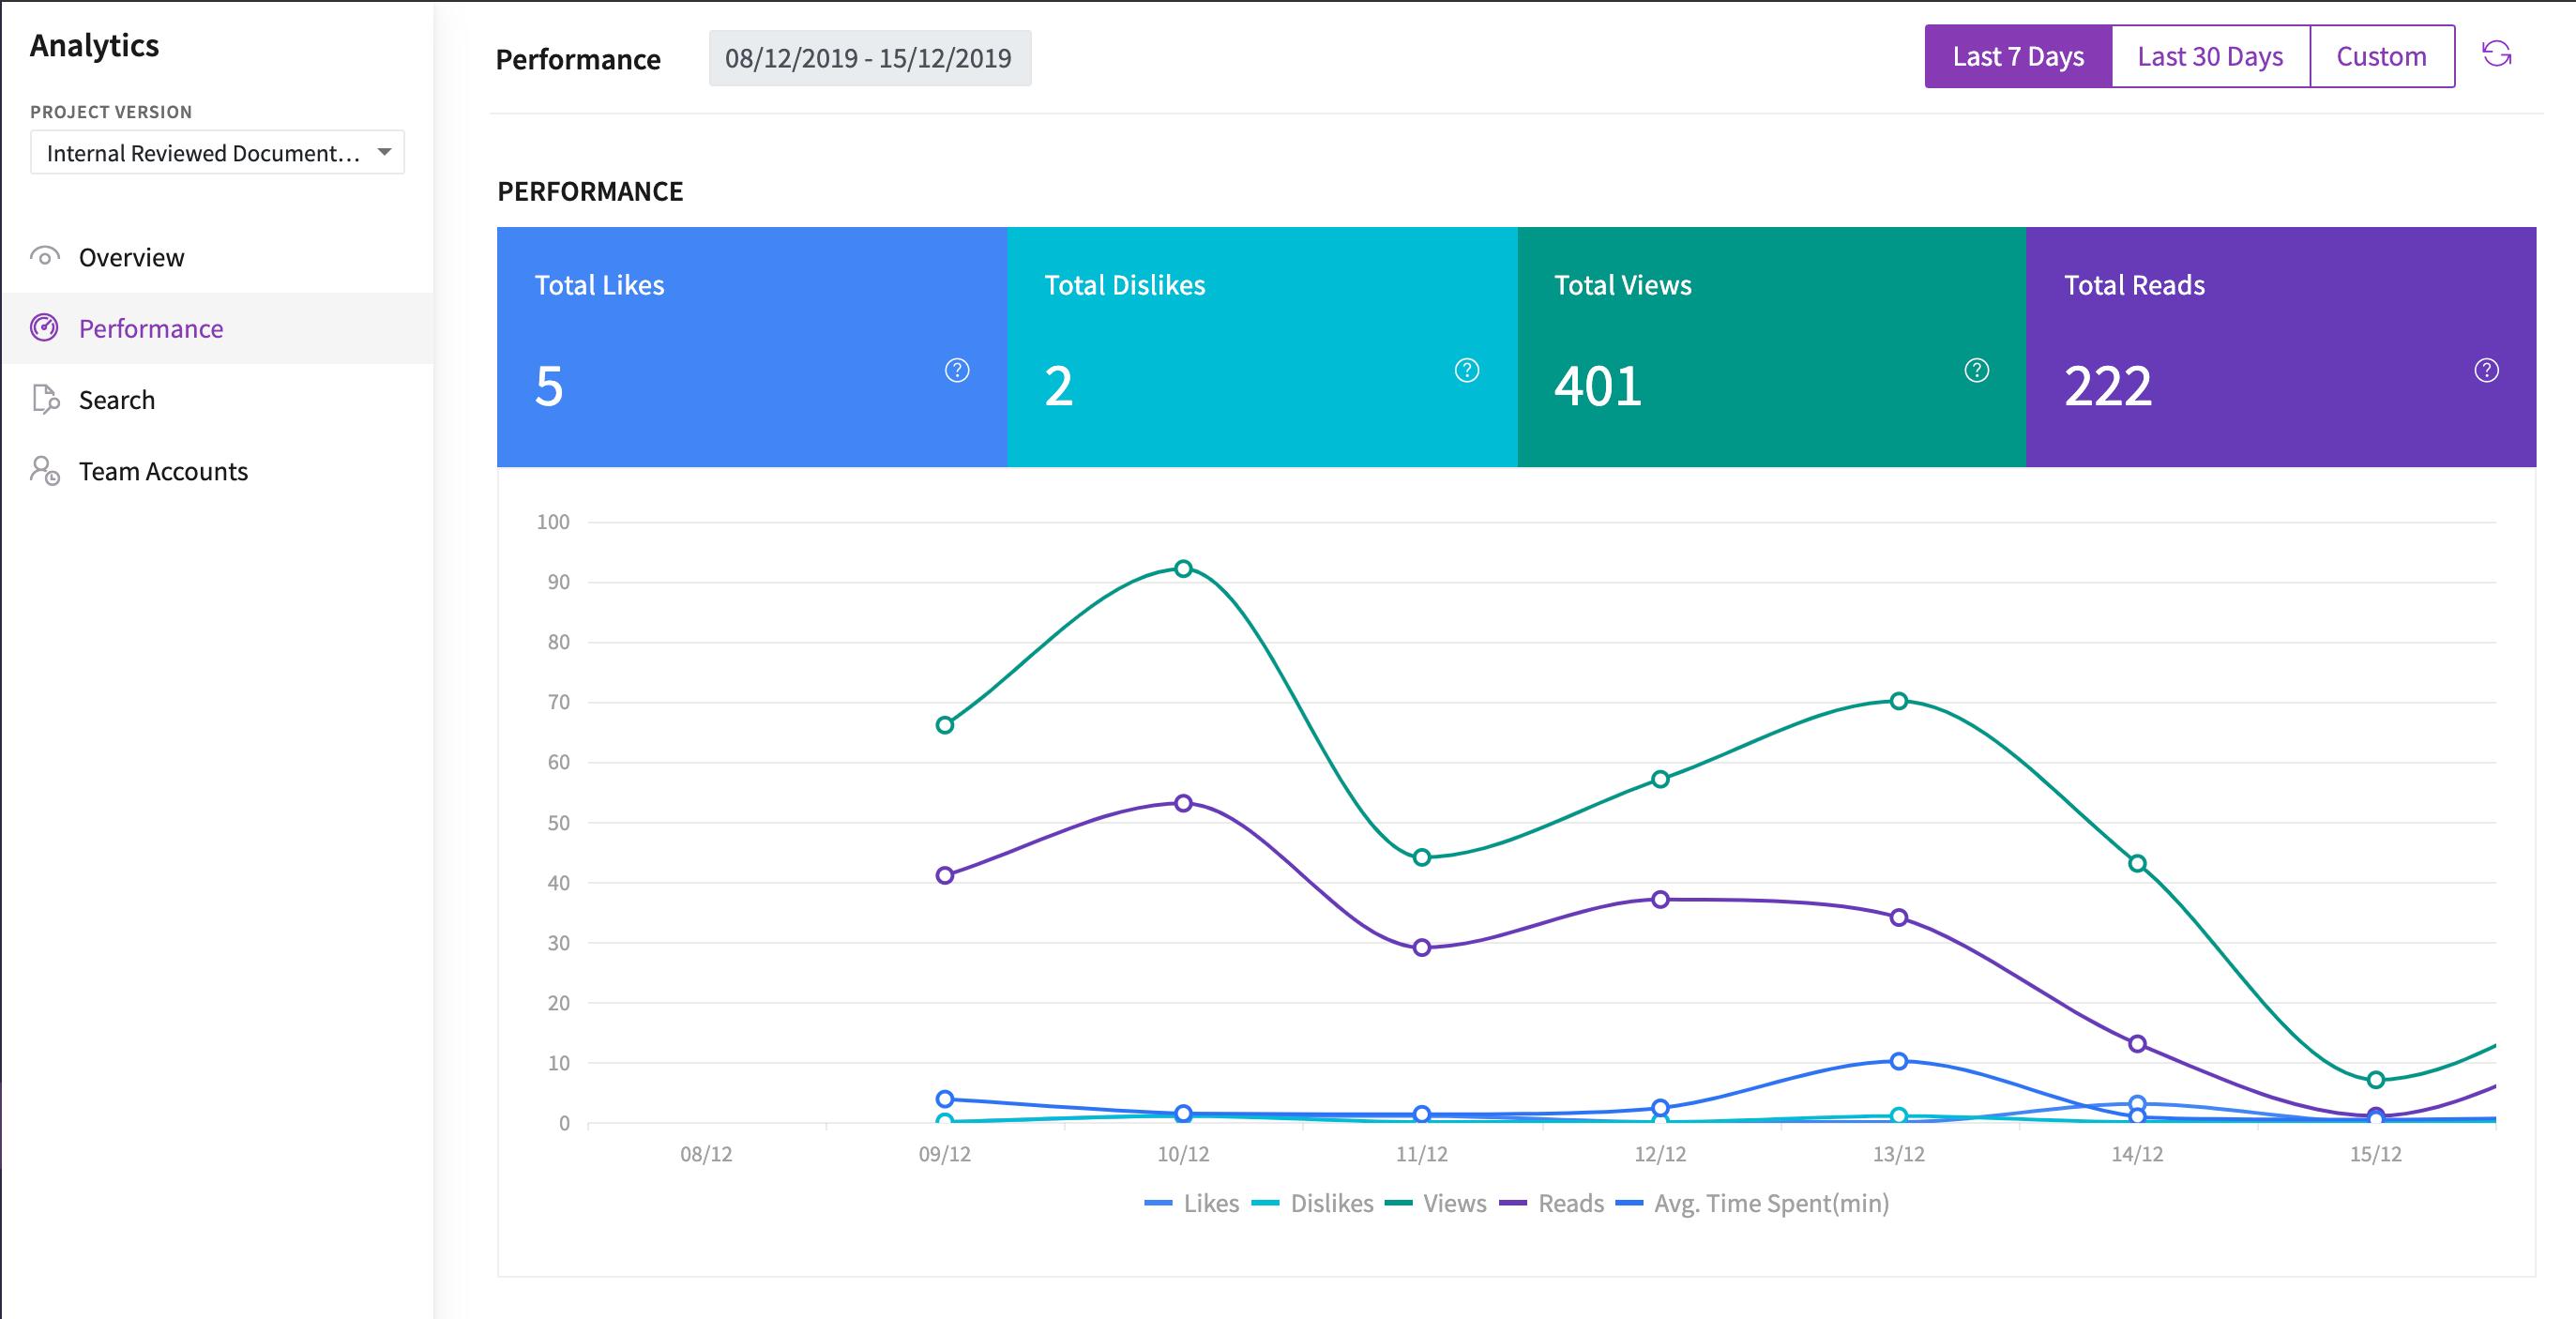 Performance Analytics graph